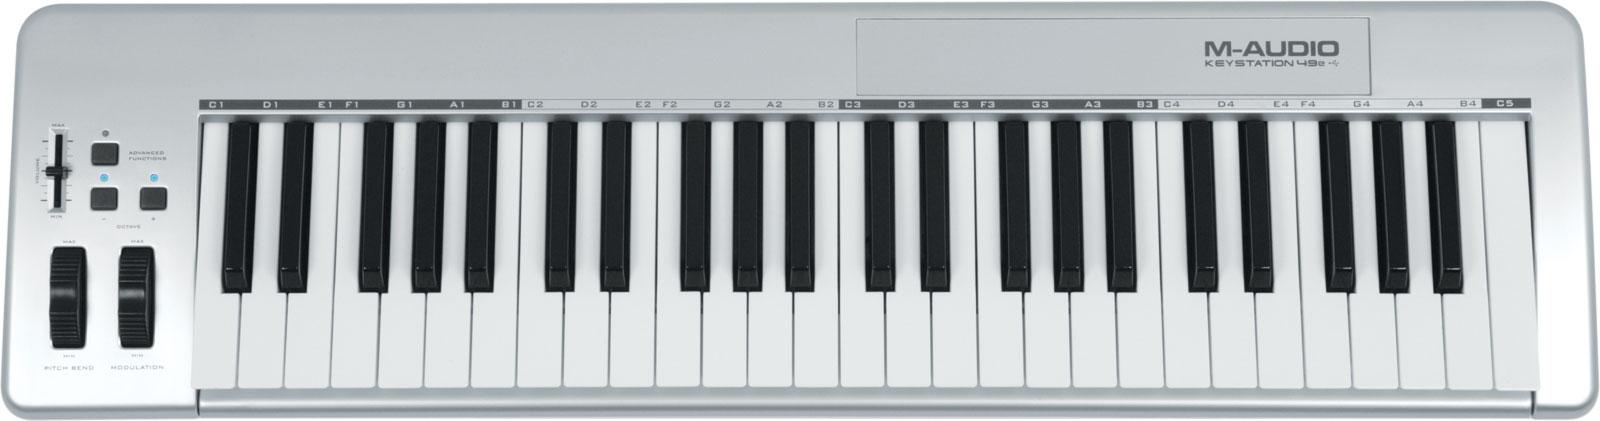 m audio keystation pro 88 manual